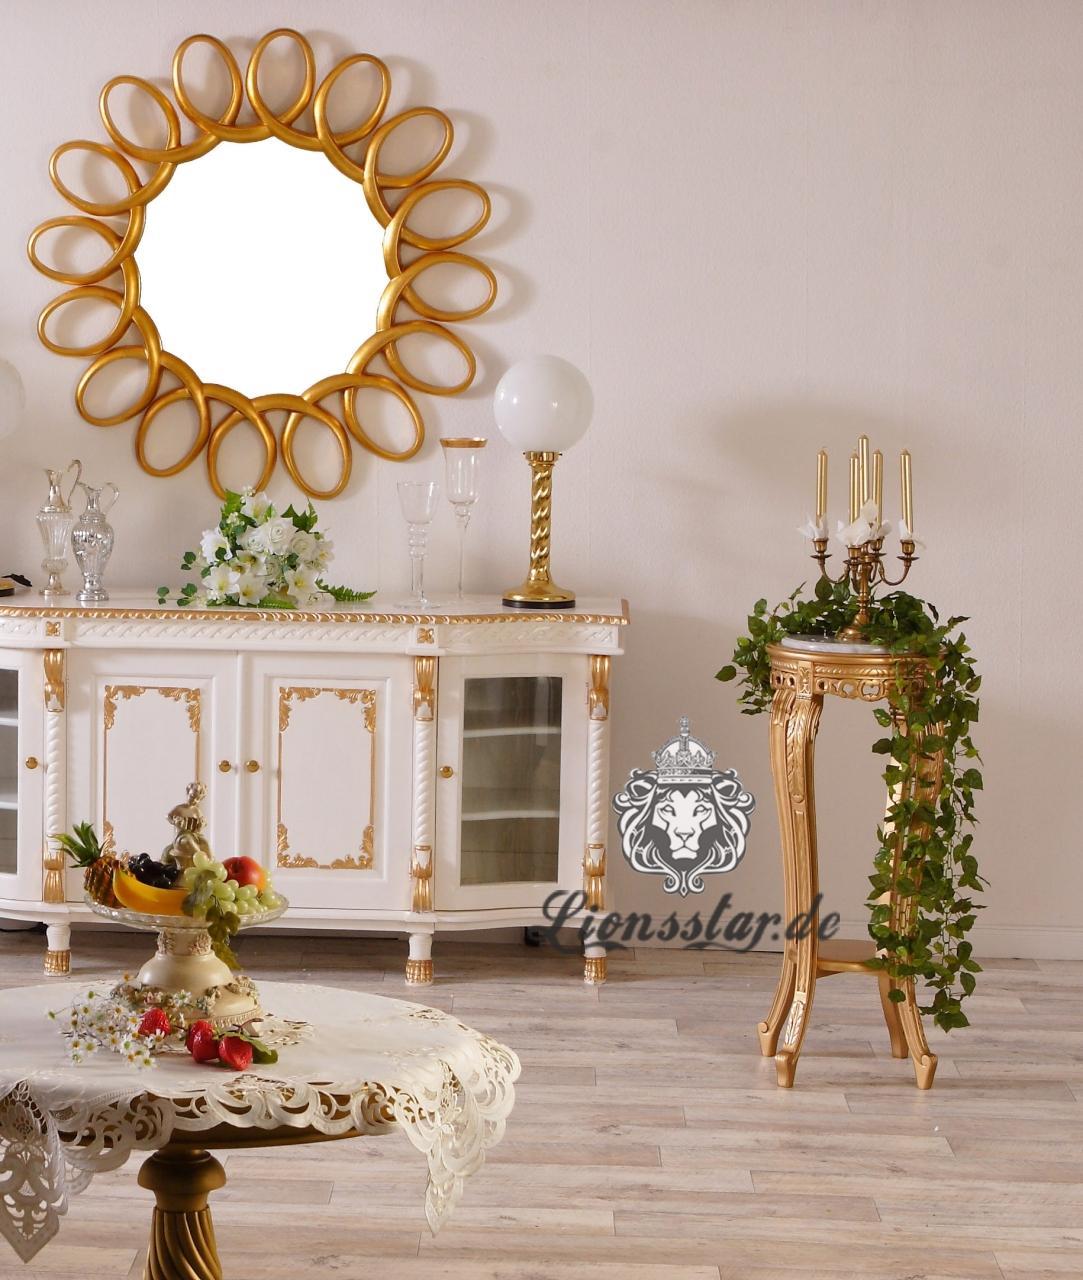 Blumensäule Pedestal-Säule-Gold-Weiß-Marmor